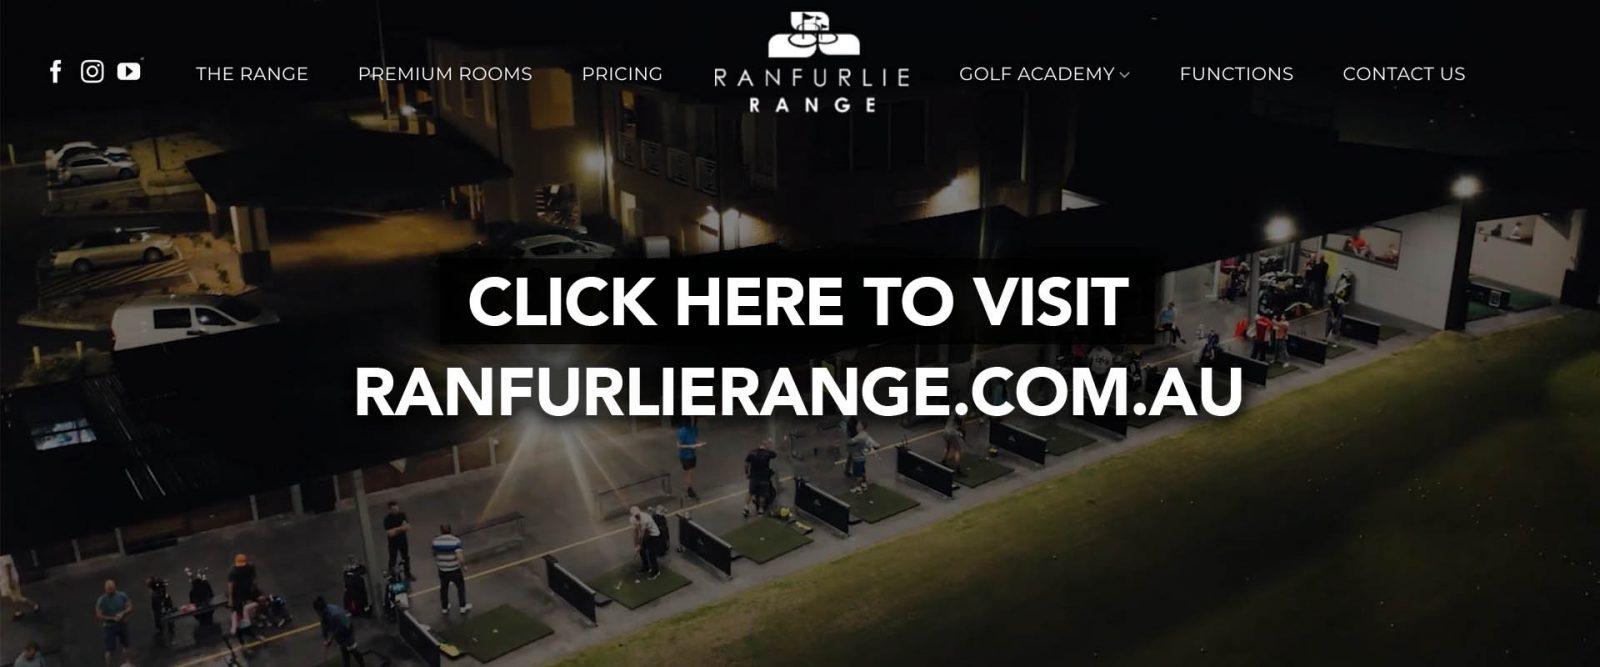 VISIT THE RANFURLIE RANGE WEBSITE